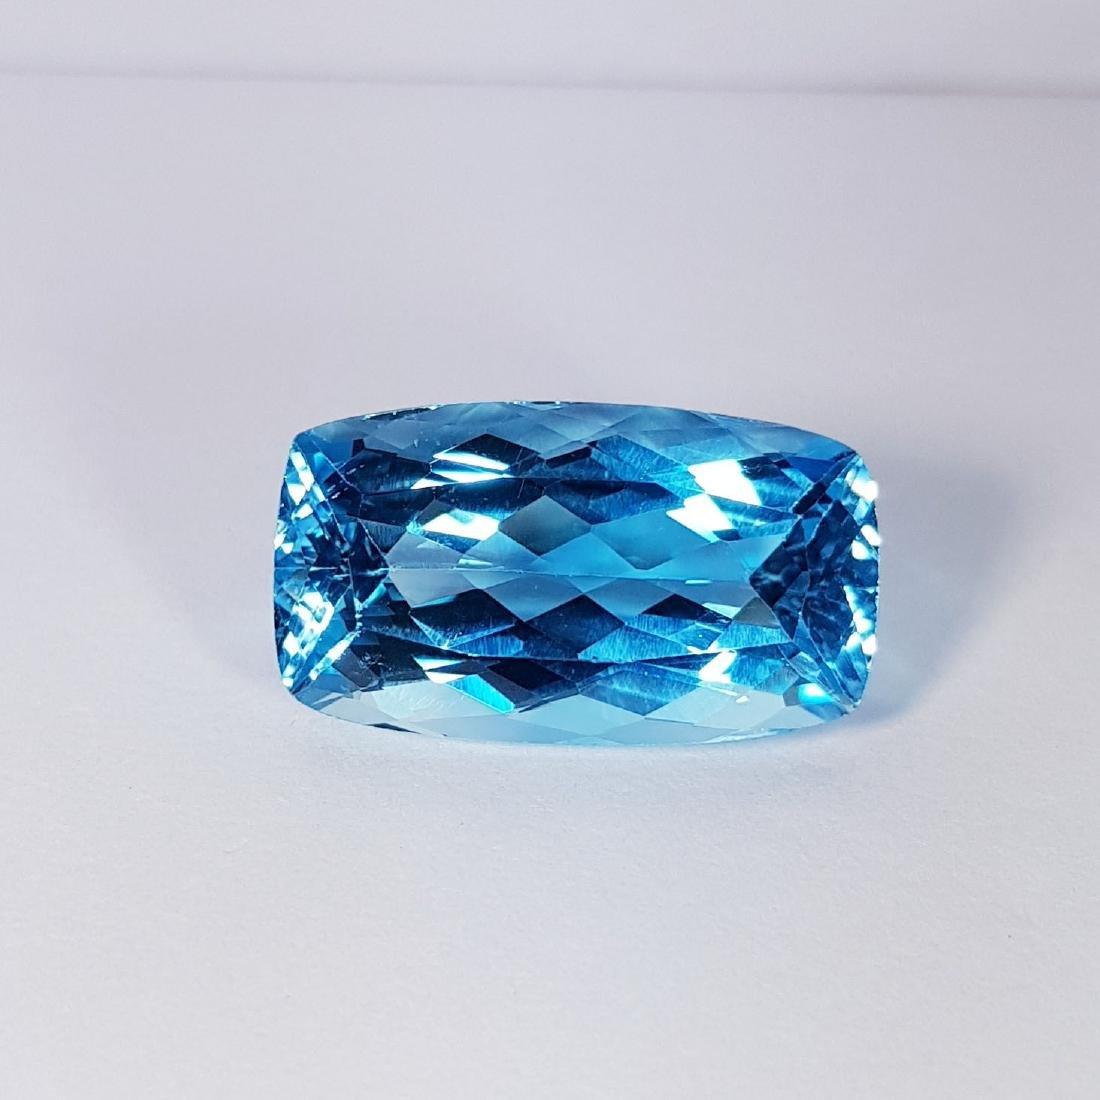 Natural Swiss Blue Topaz - 25.16 ct